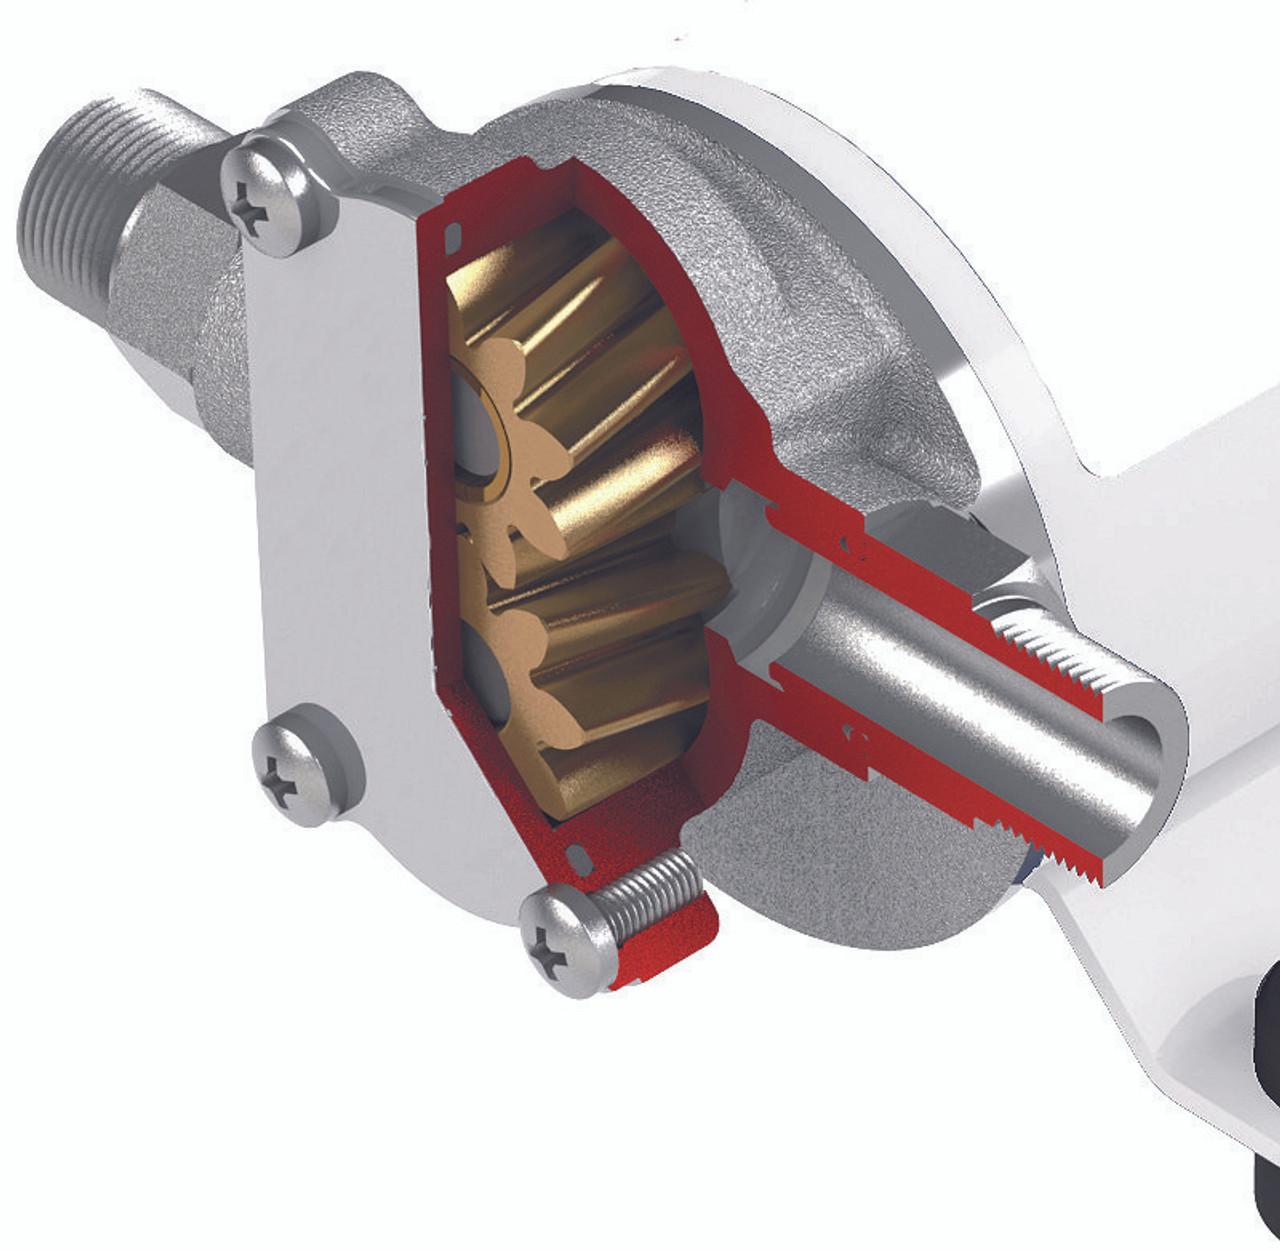 12 Volt gear pump for motor oil or diesel fuel